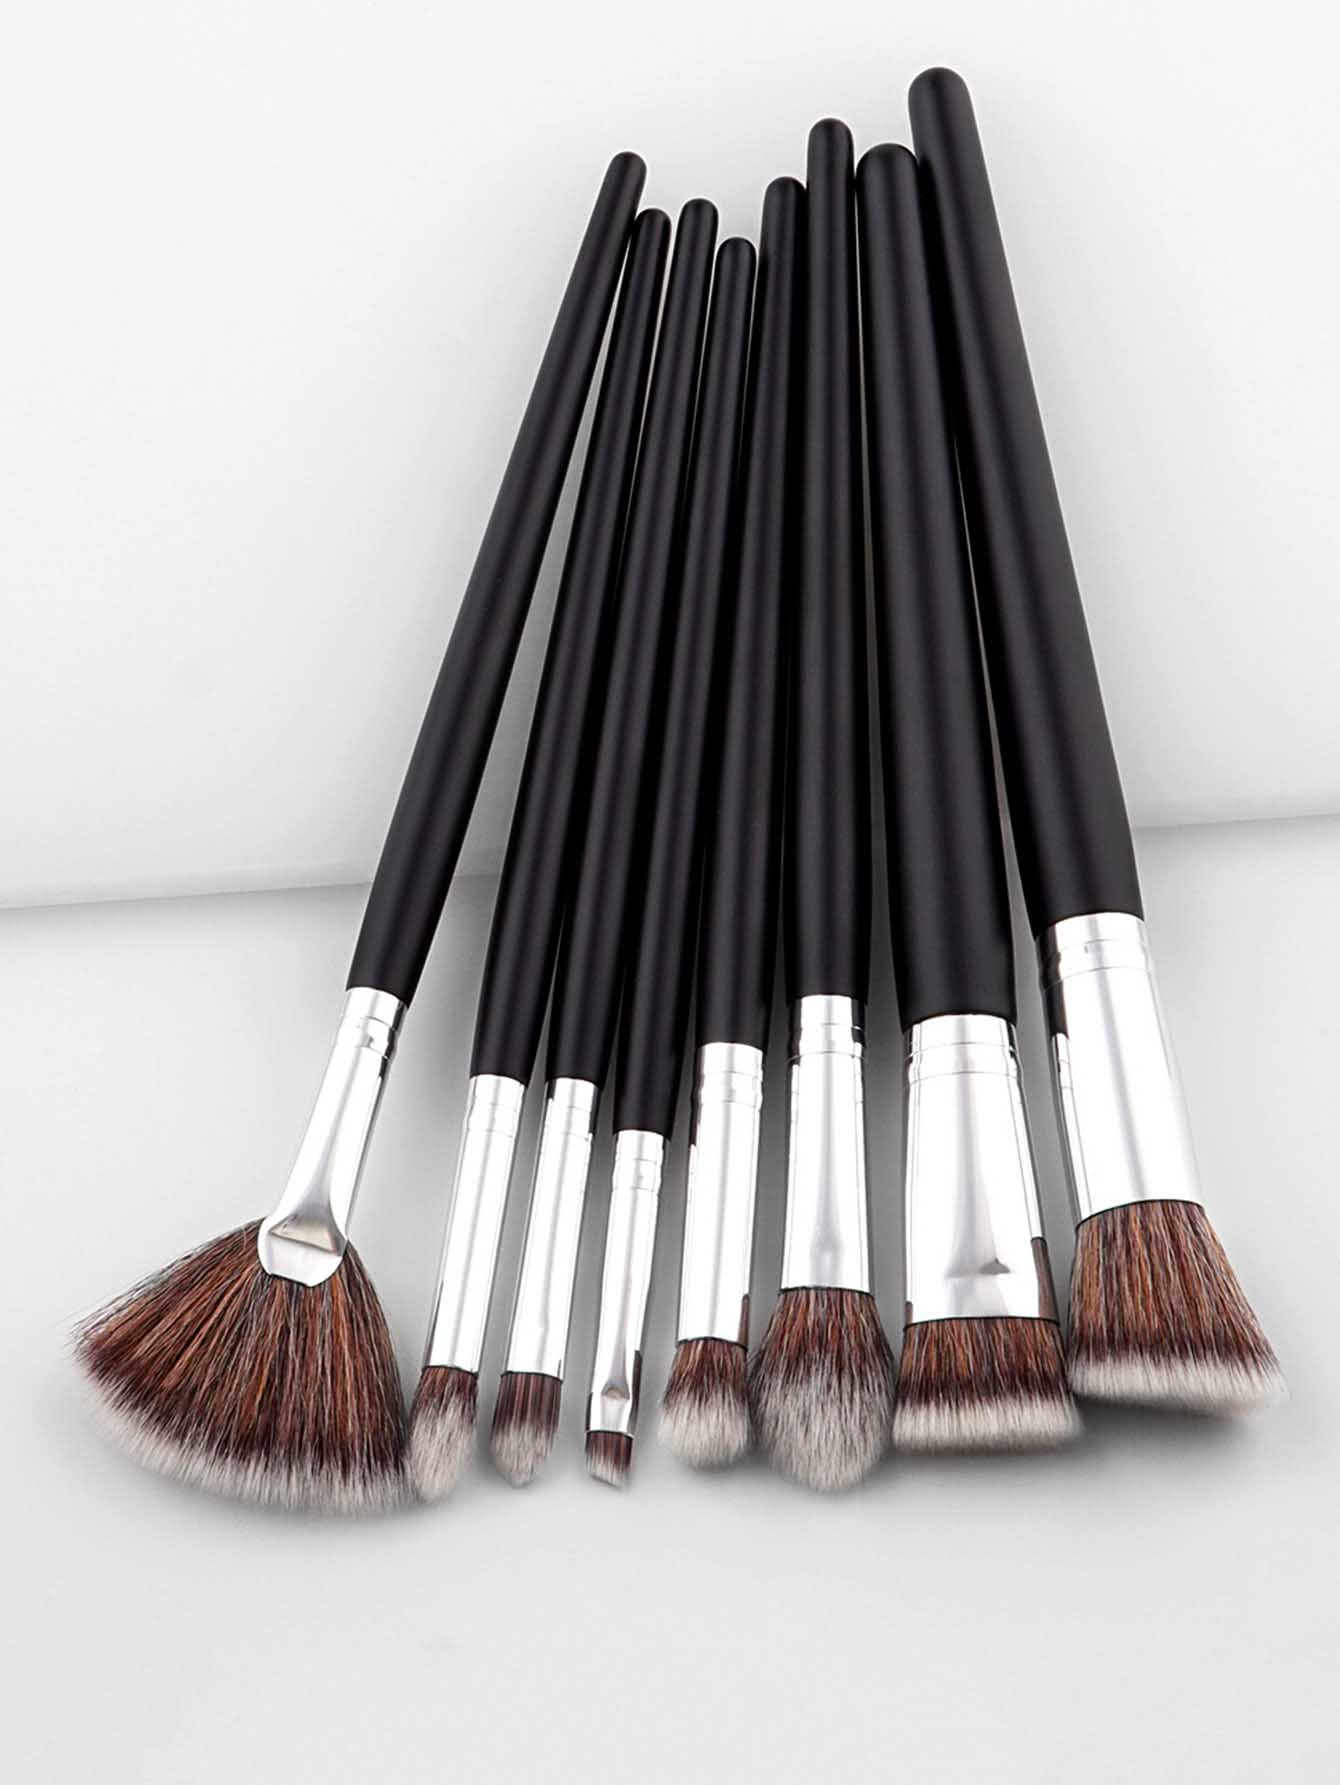 Two Tone Handle Professional Makeup Brush Set